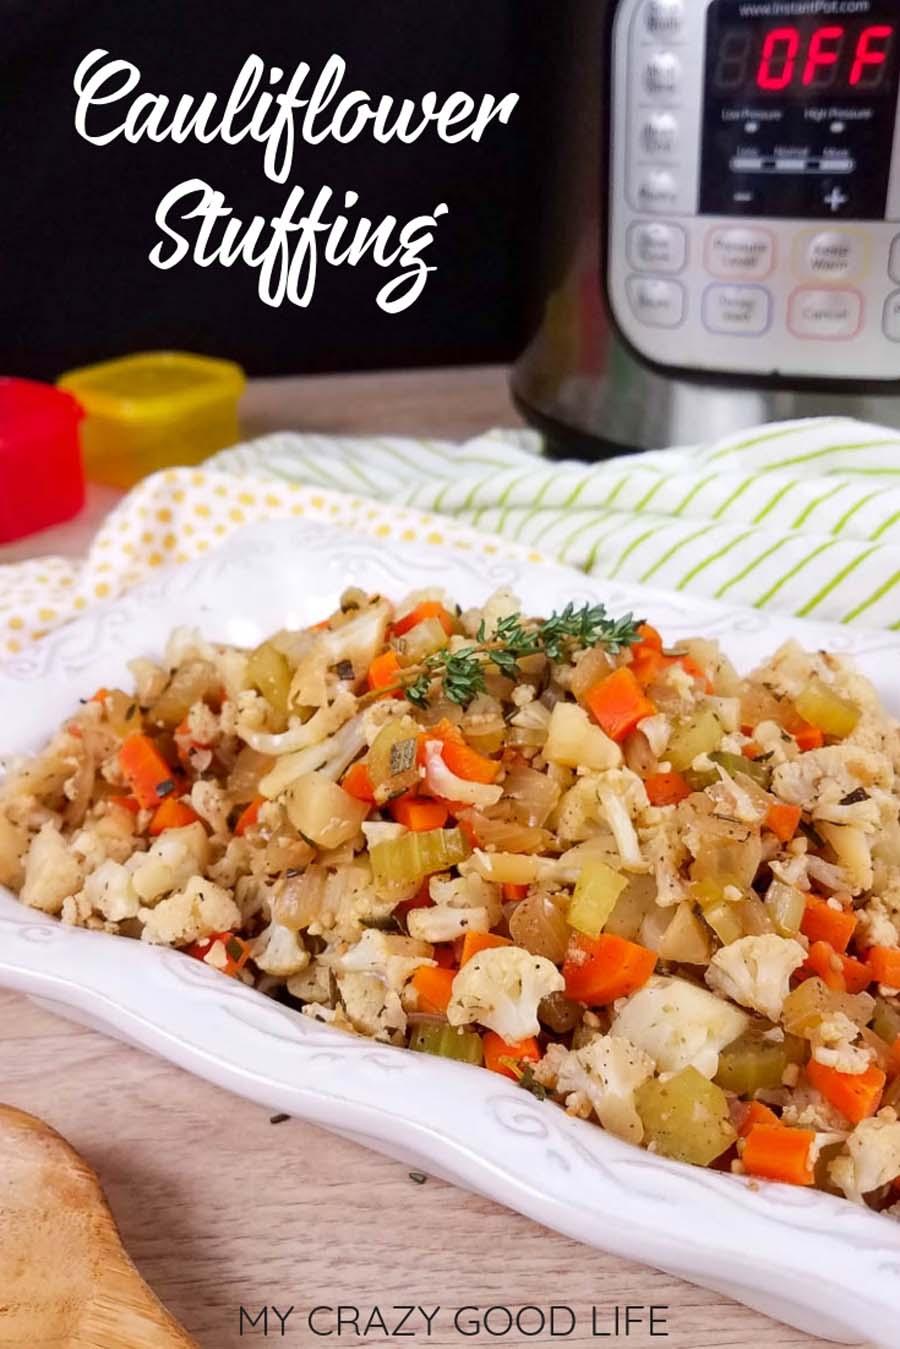 Cauliflower-Stuffing-2